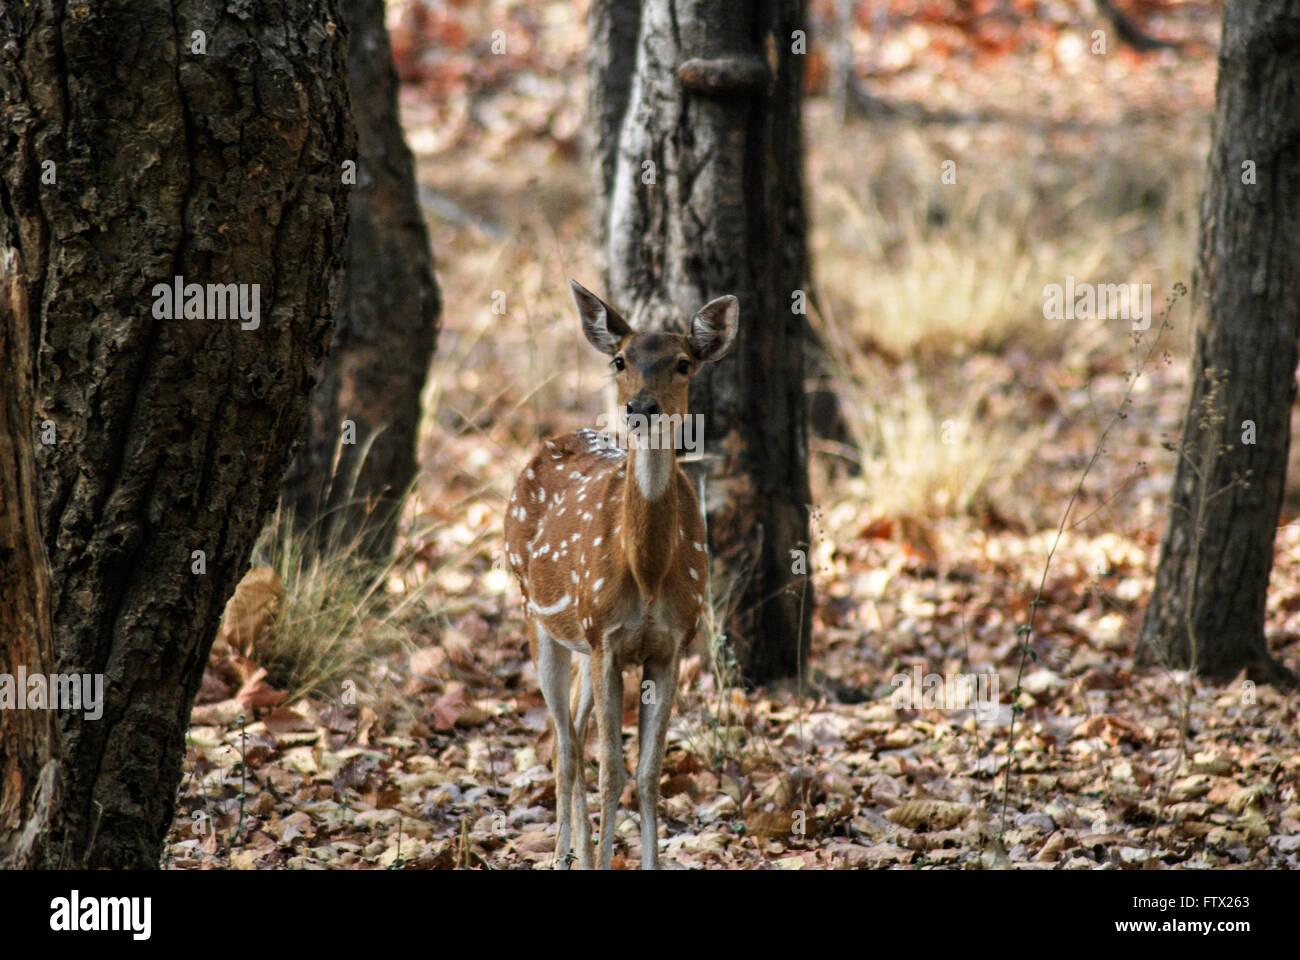 Spotted deer, Bandhavgarh national park - Stock Image